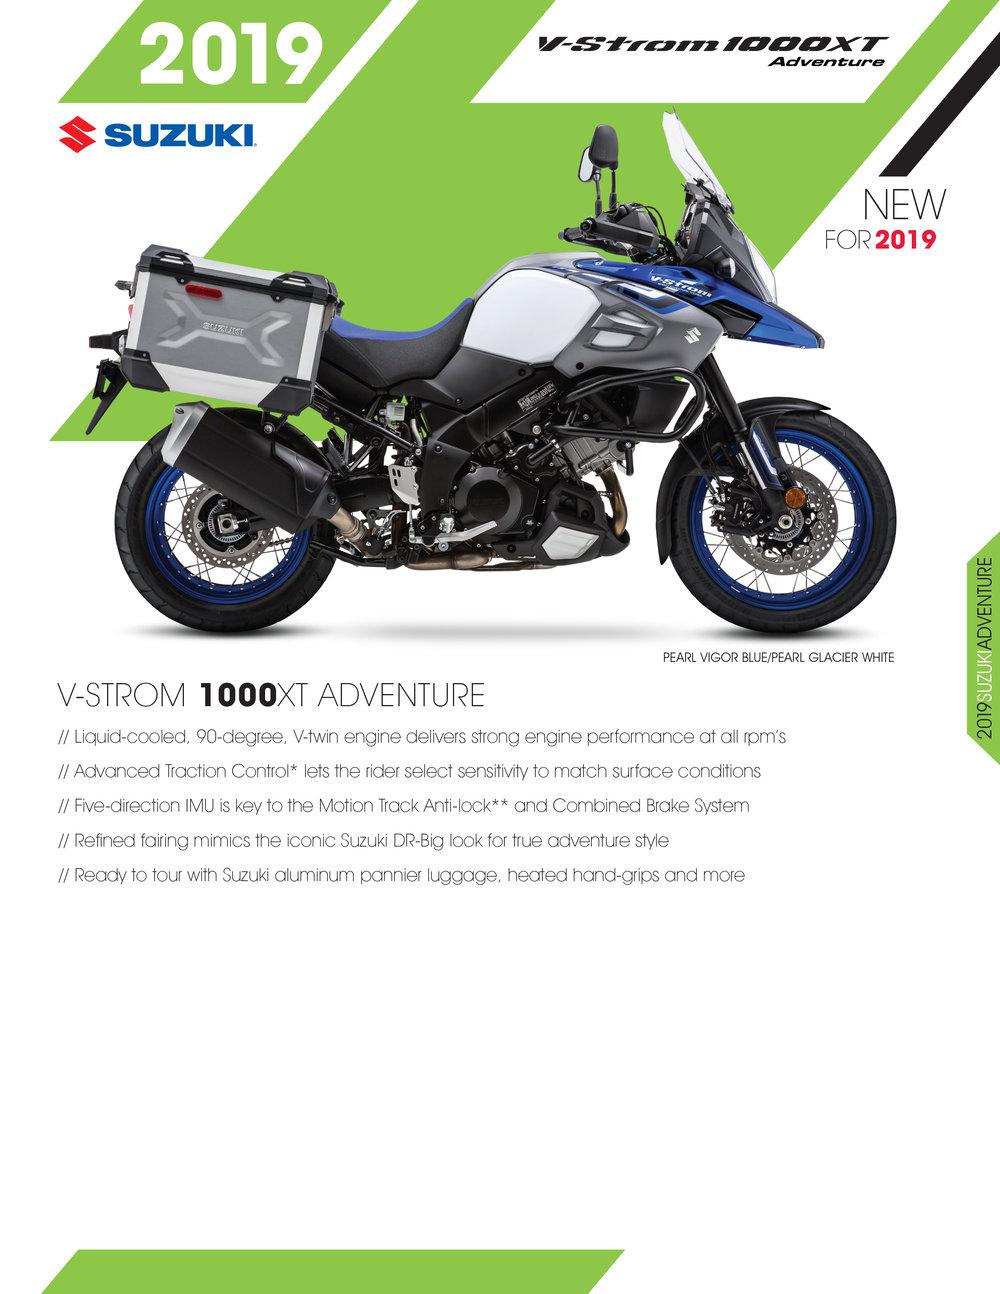 SUZ-1009_Adventure_V-Strom_1000XT_Adventure_OS_Hi_F-1.jpg